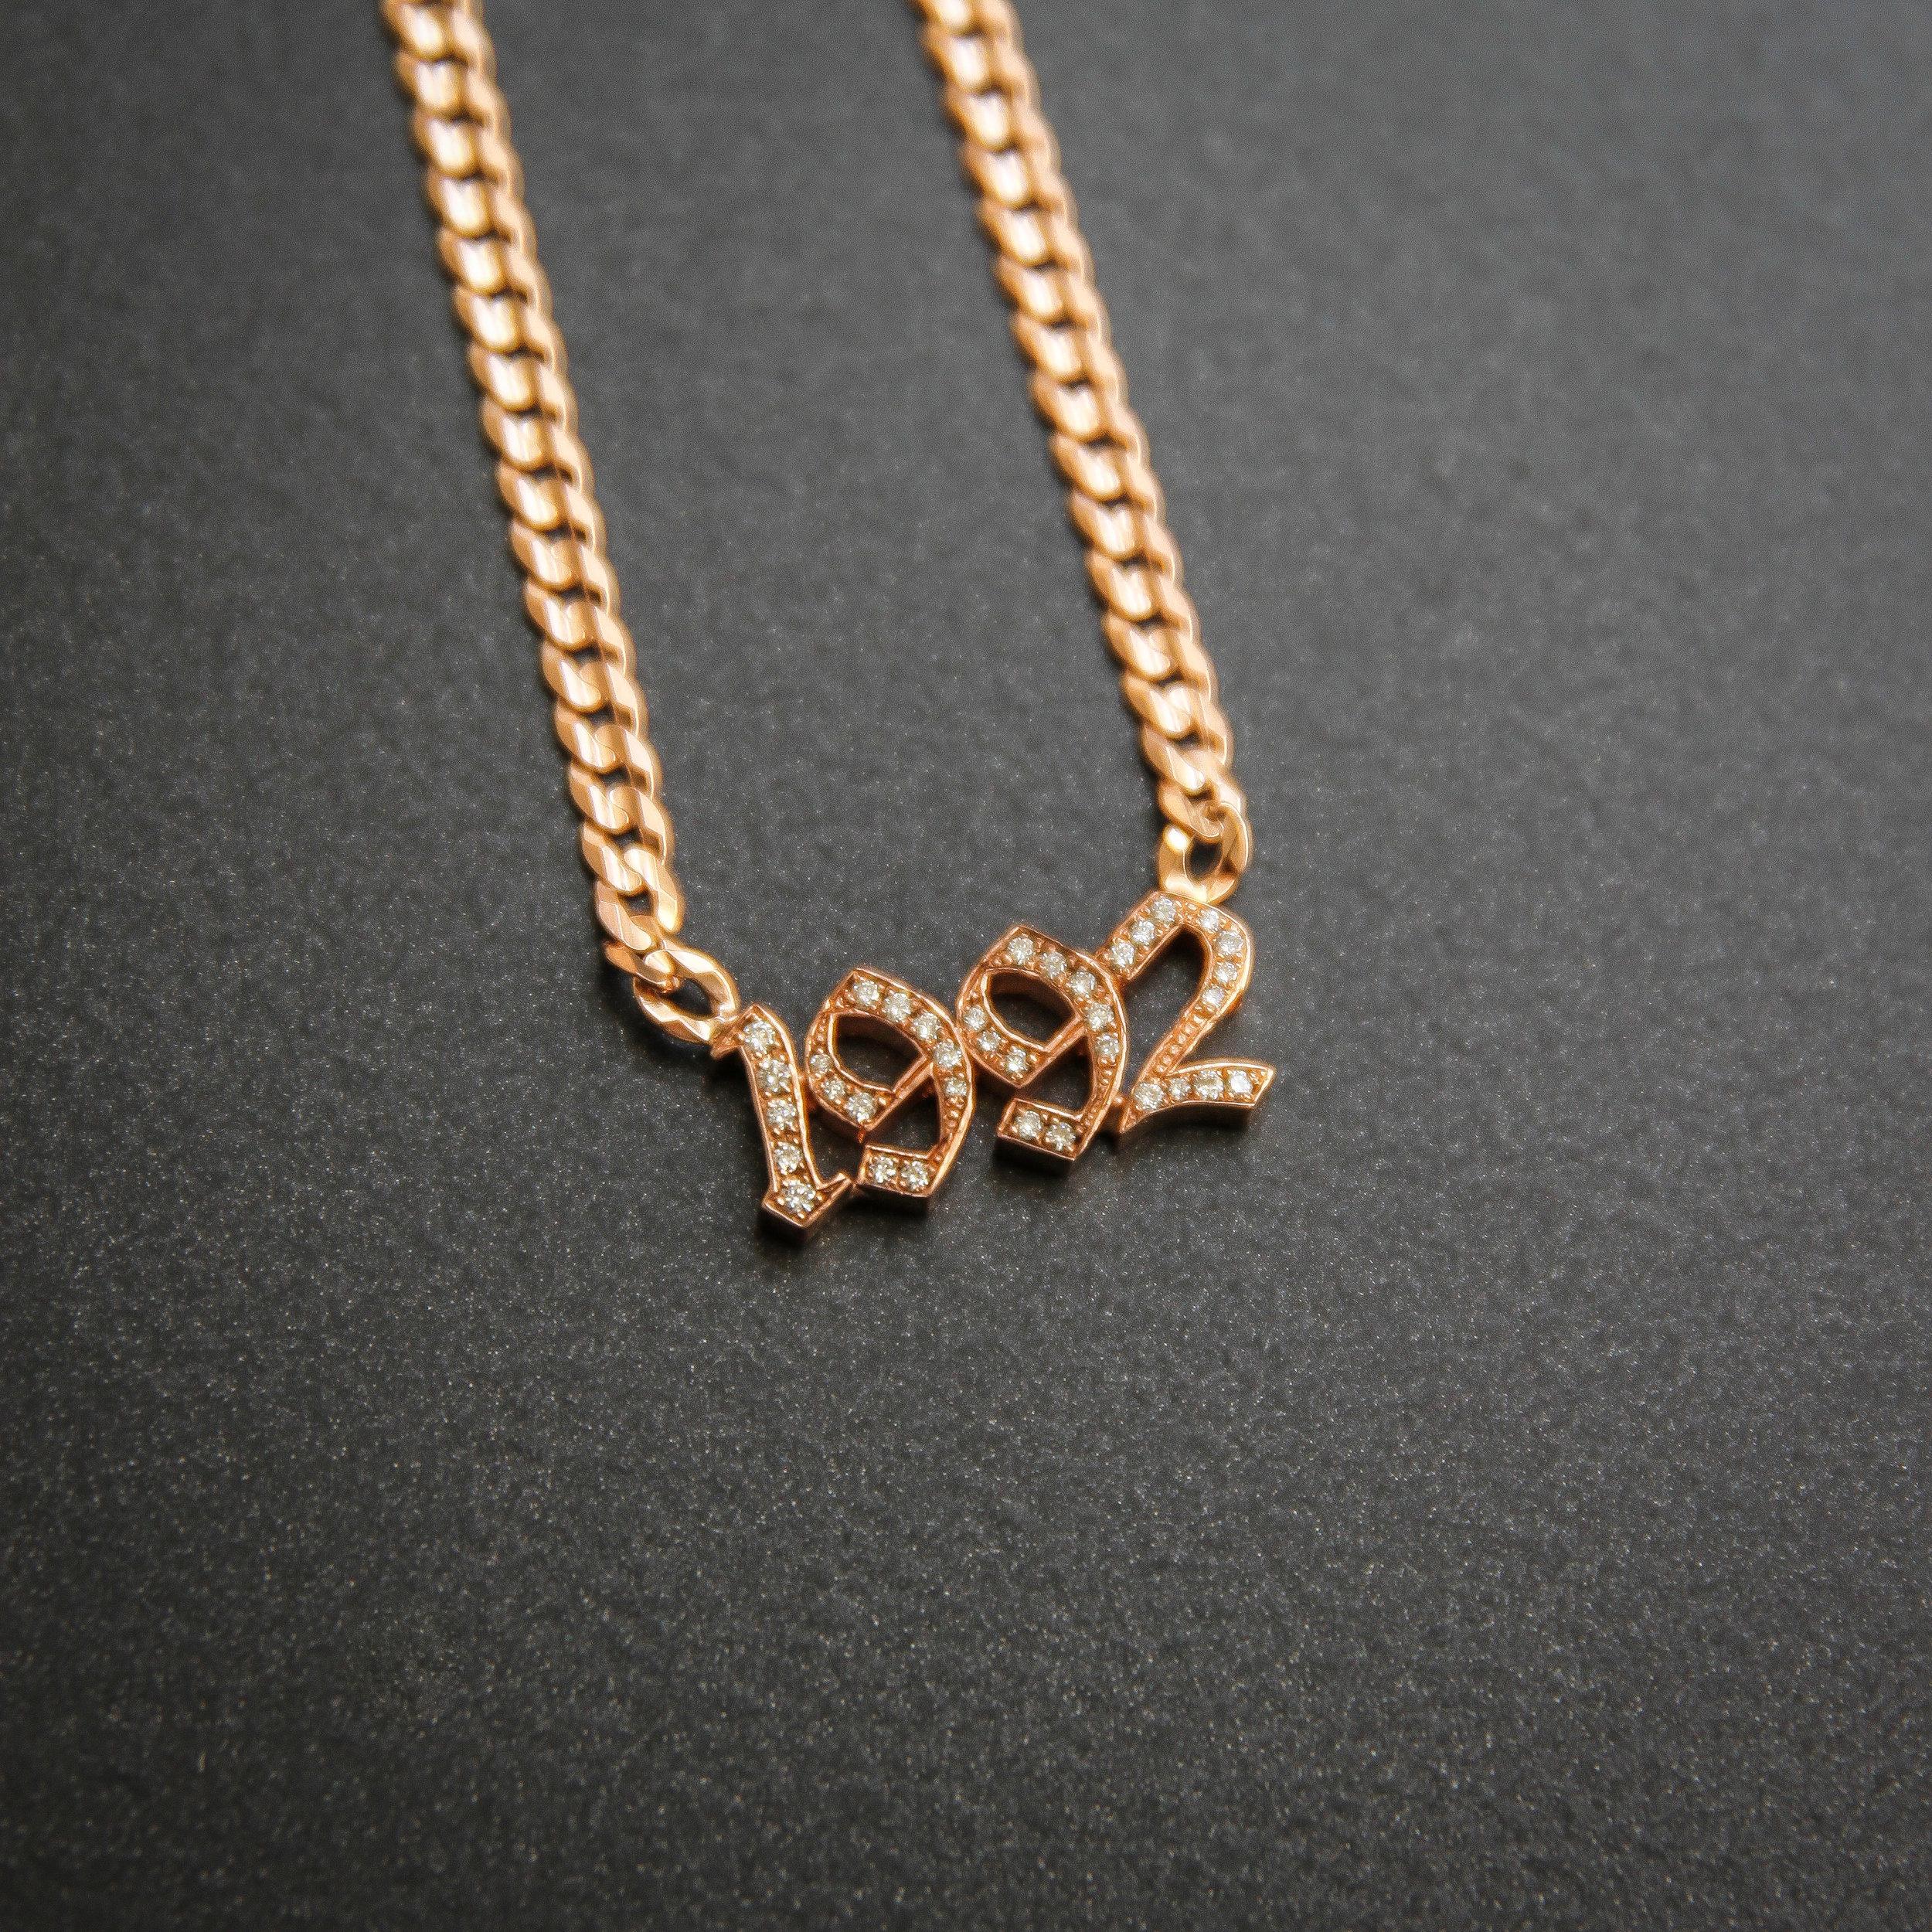 Nameplate Necklace '1992'_Shayan Afshar